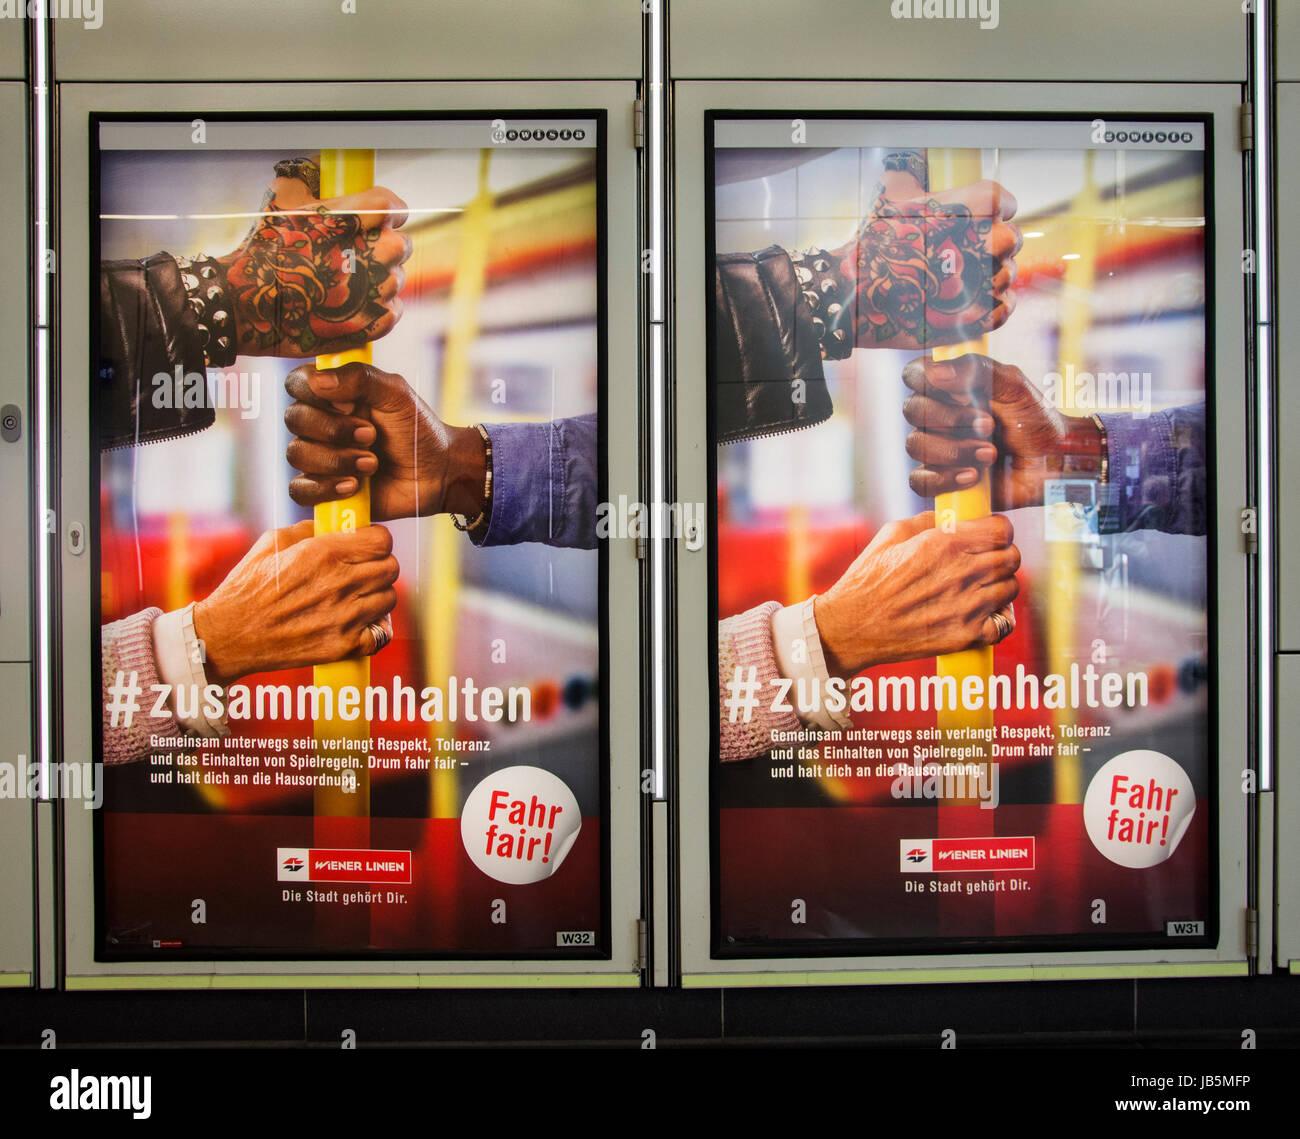 Billboards promoting tolerance and diversity on the U-Bahn underground railway system in Vienna, Austria - Stock Image